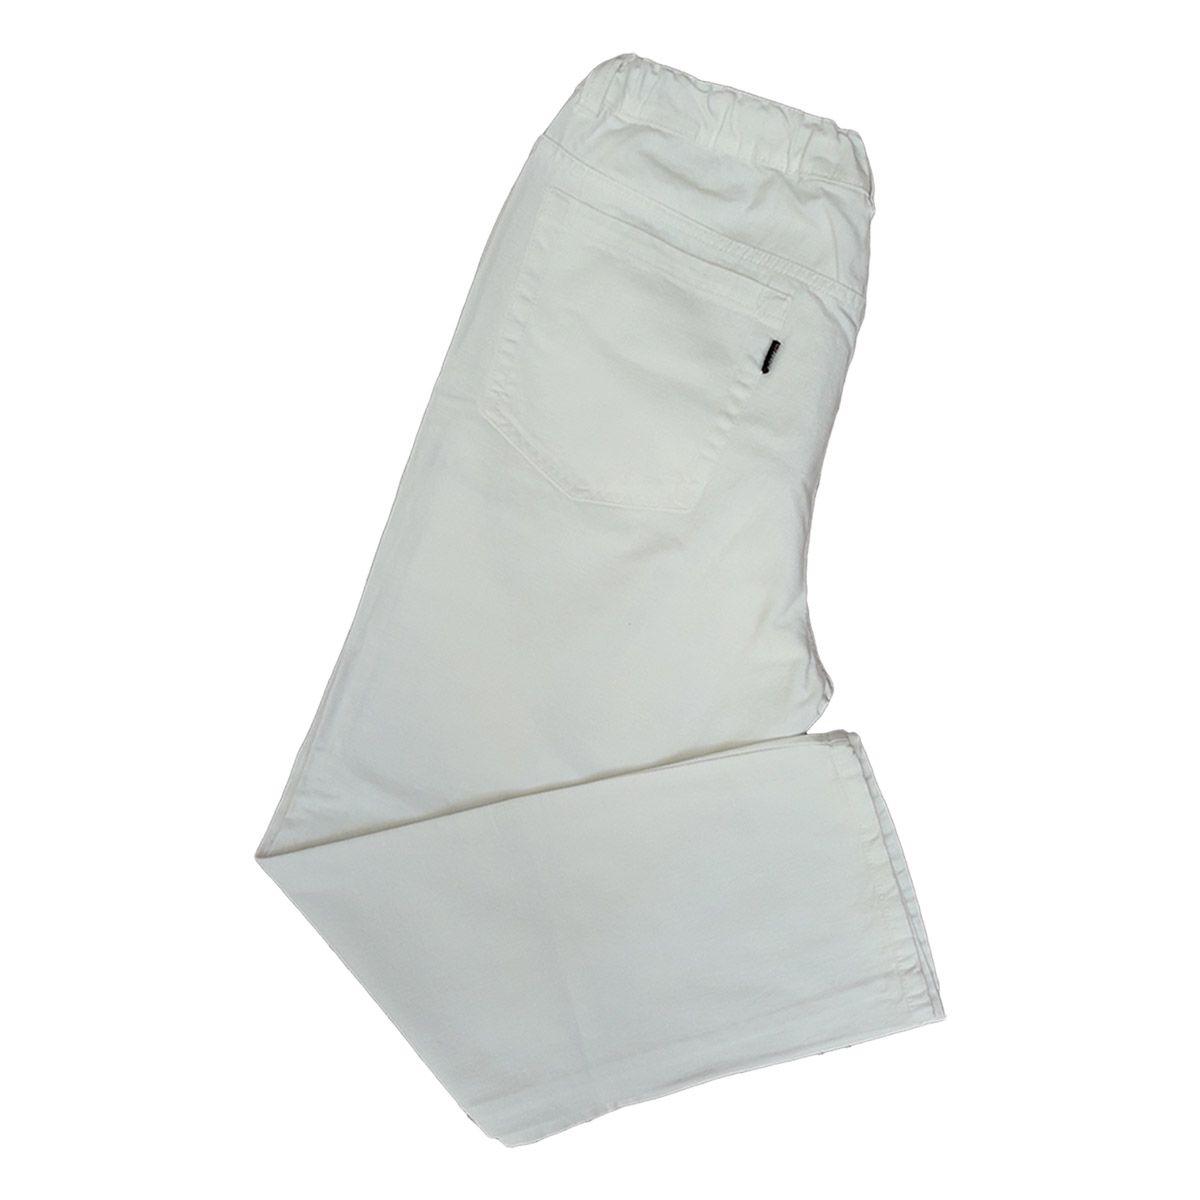 Calça Jeans Masculina Branca C Elástico Plus Size Tamanho 52